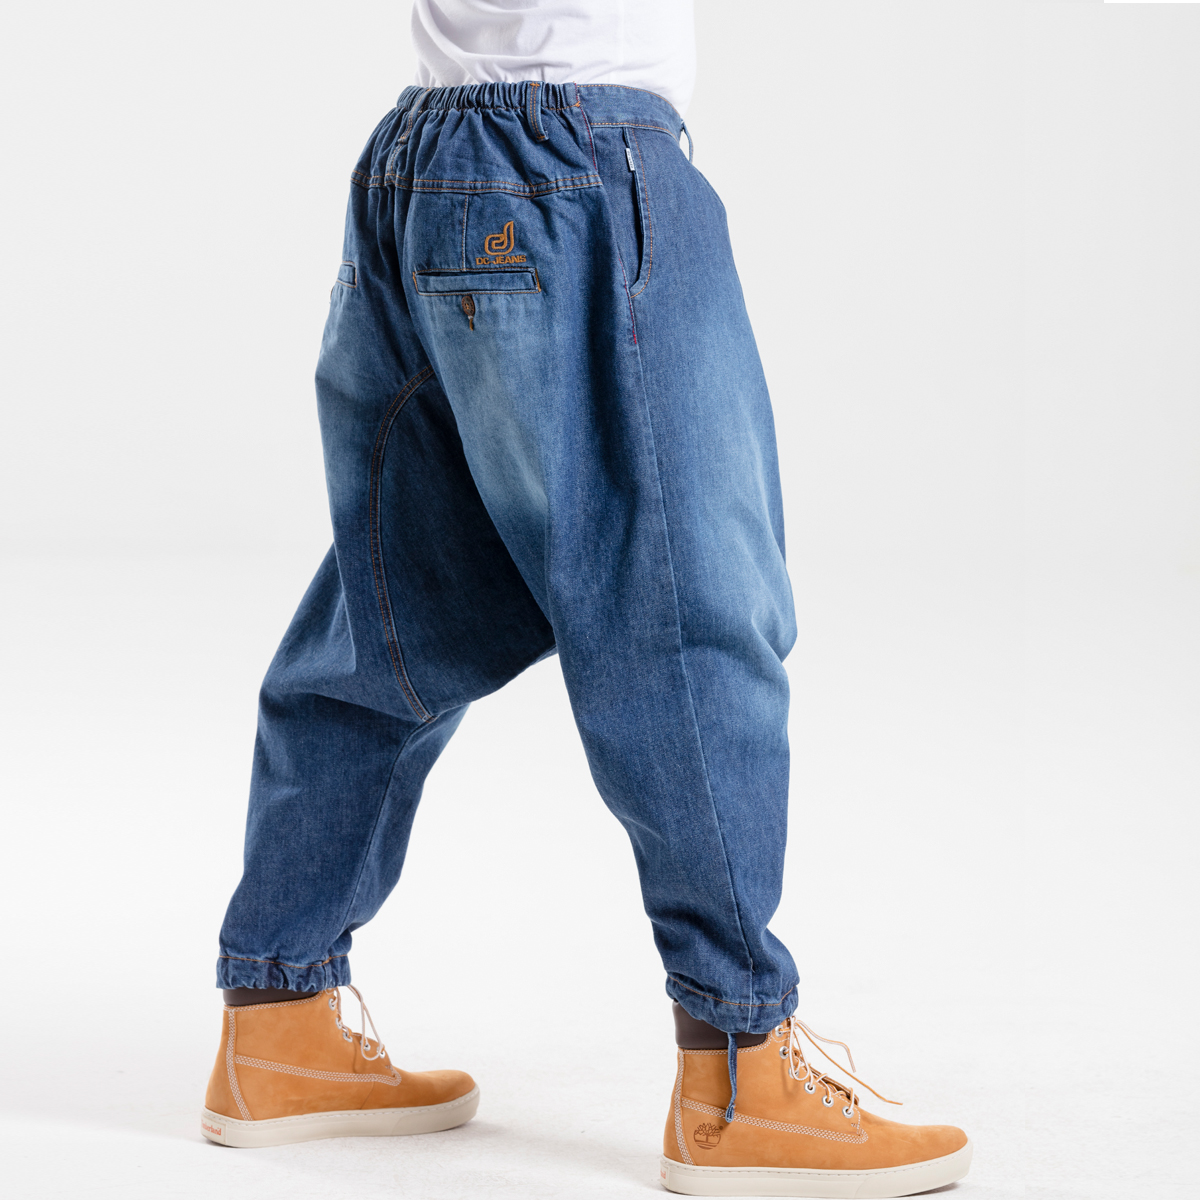 saroual jeans evo light used dcjeans profil